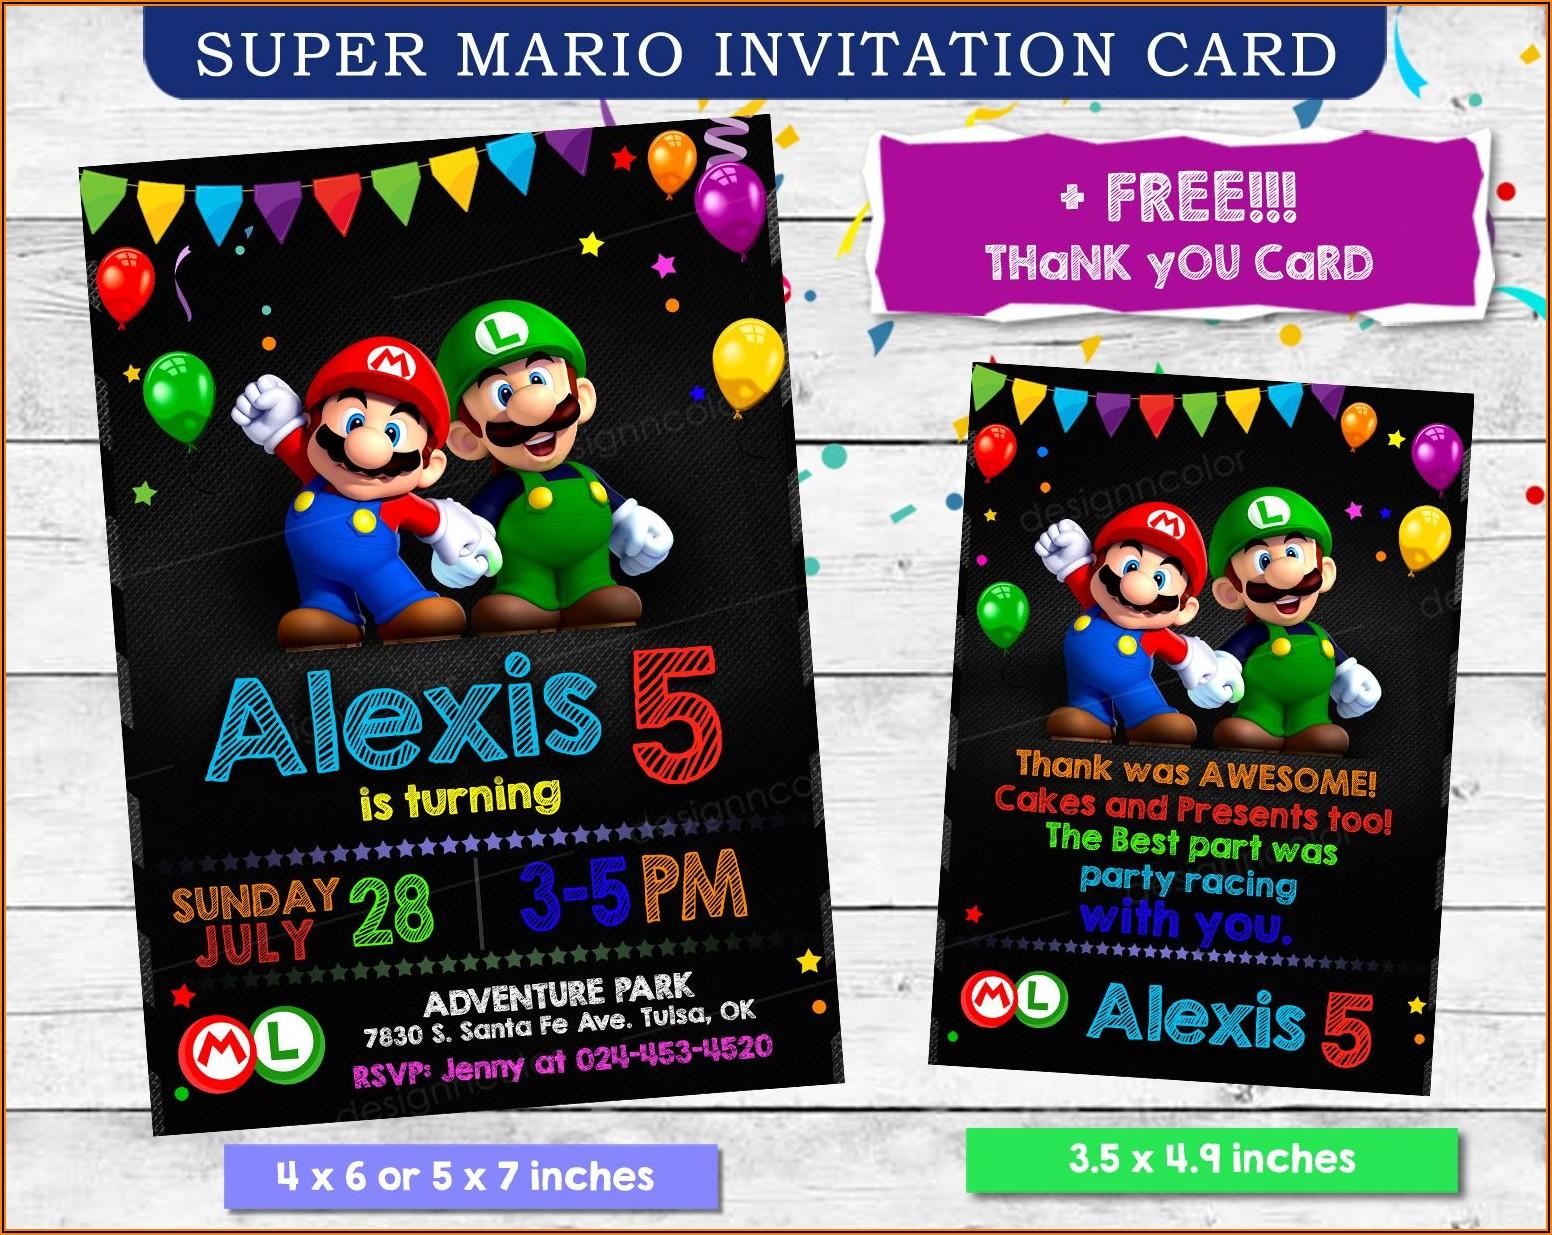 Super Mario Birthday Invitation Card